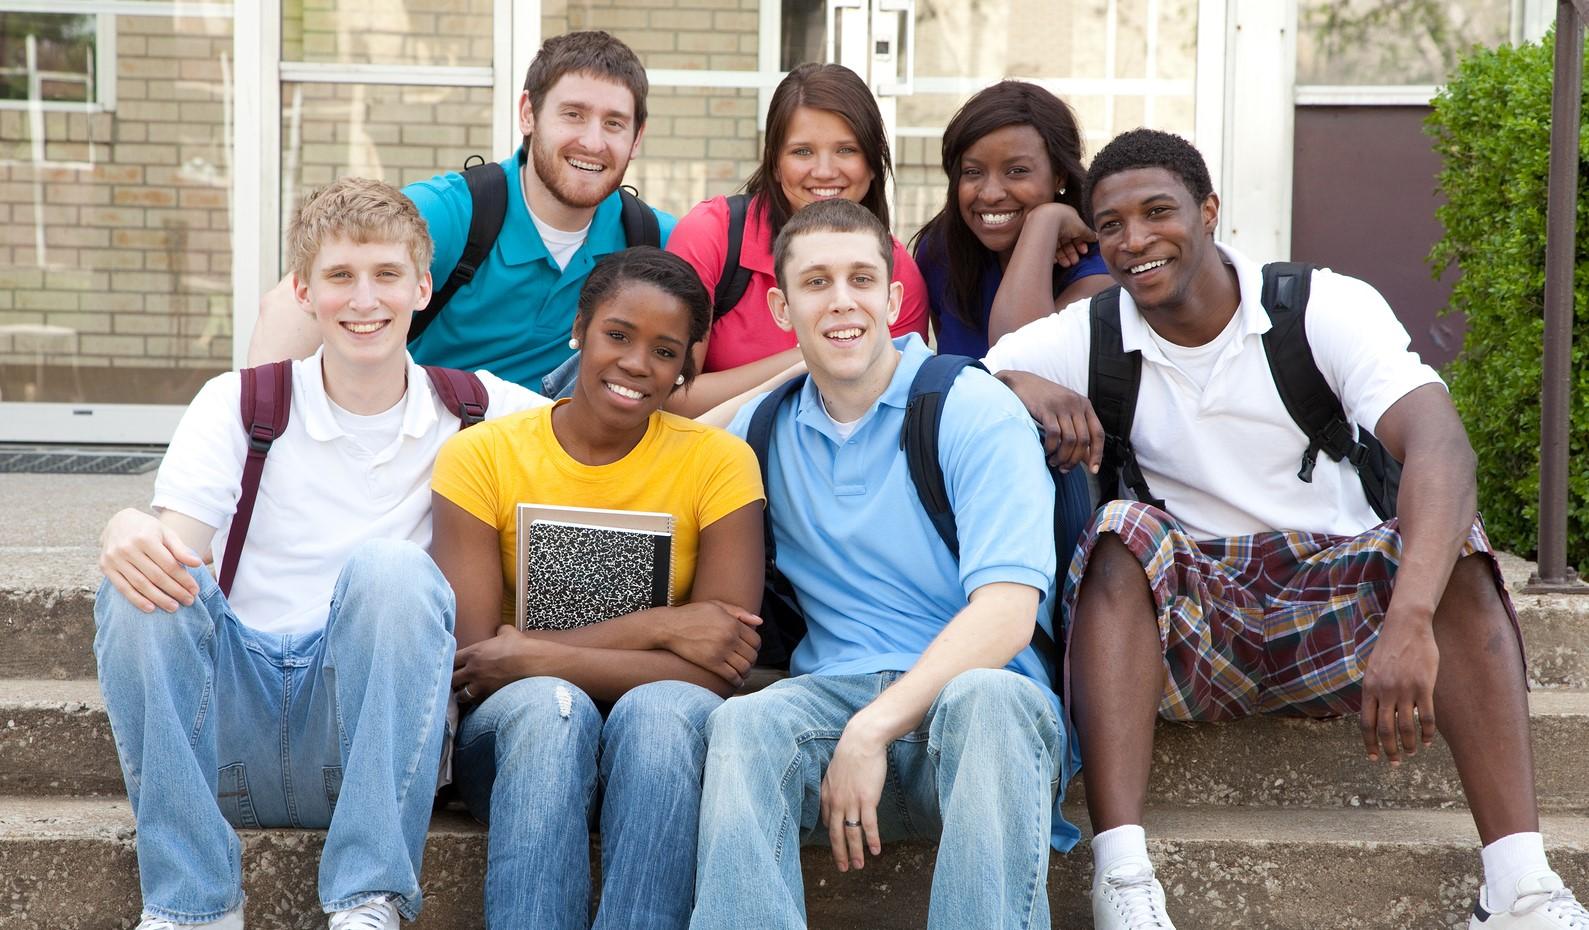 USSA - United States Student Association